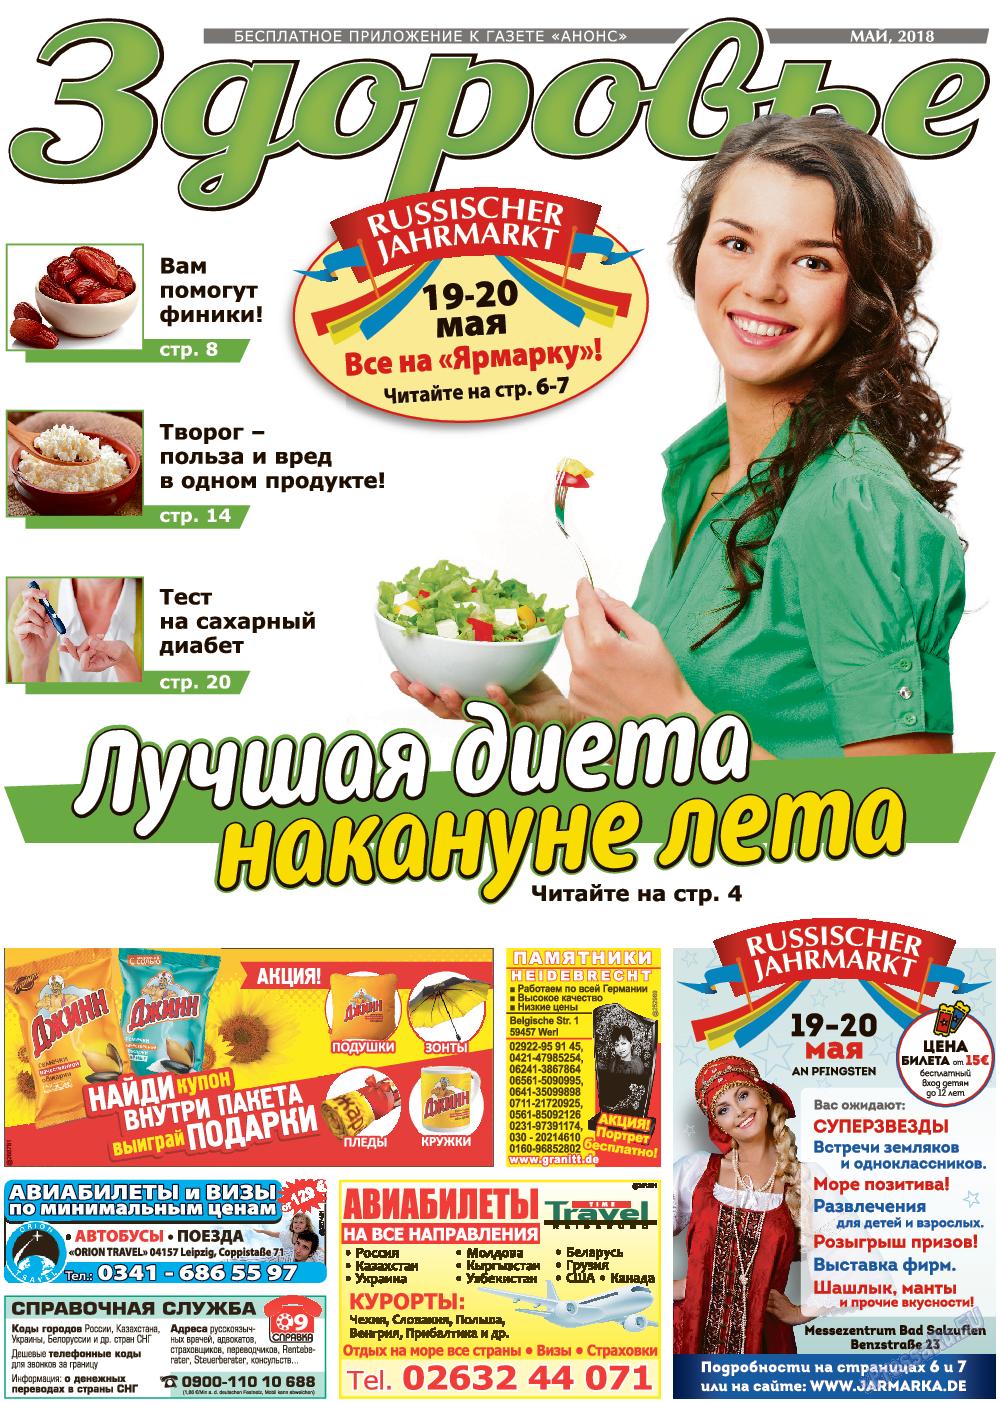 Здоровье (газета). 2018 год, номер 5, стр. 1